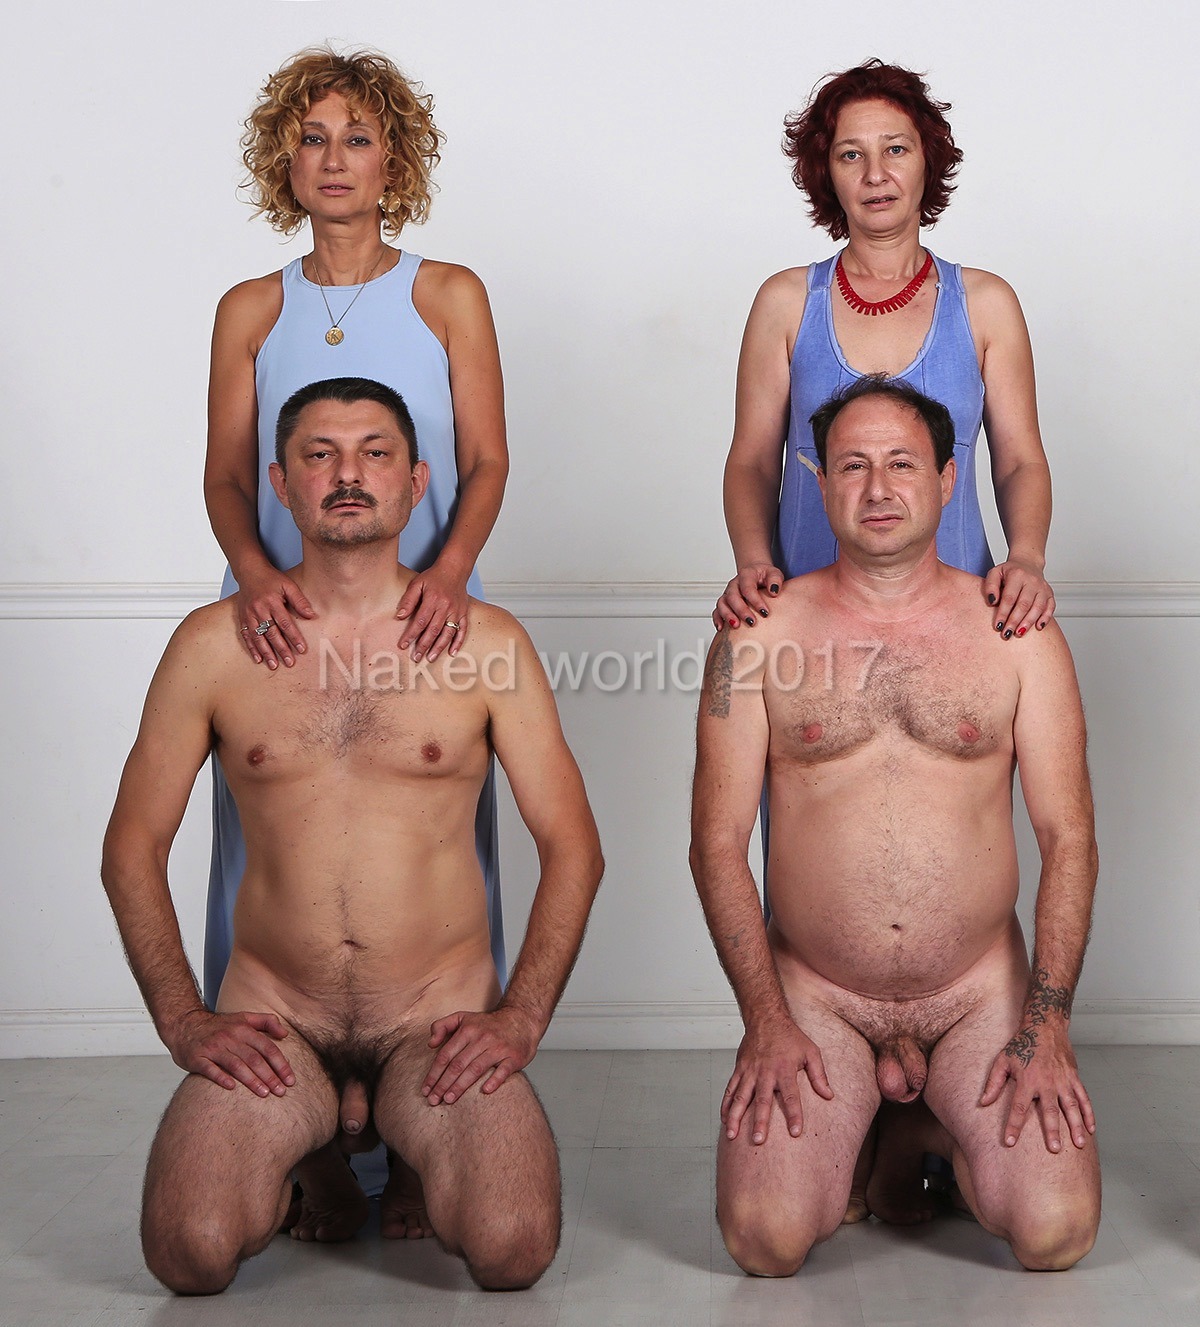 Blue naked women Three Women In Blue Naked World